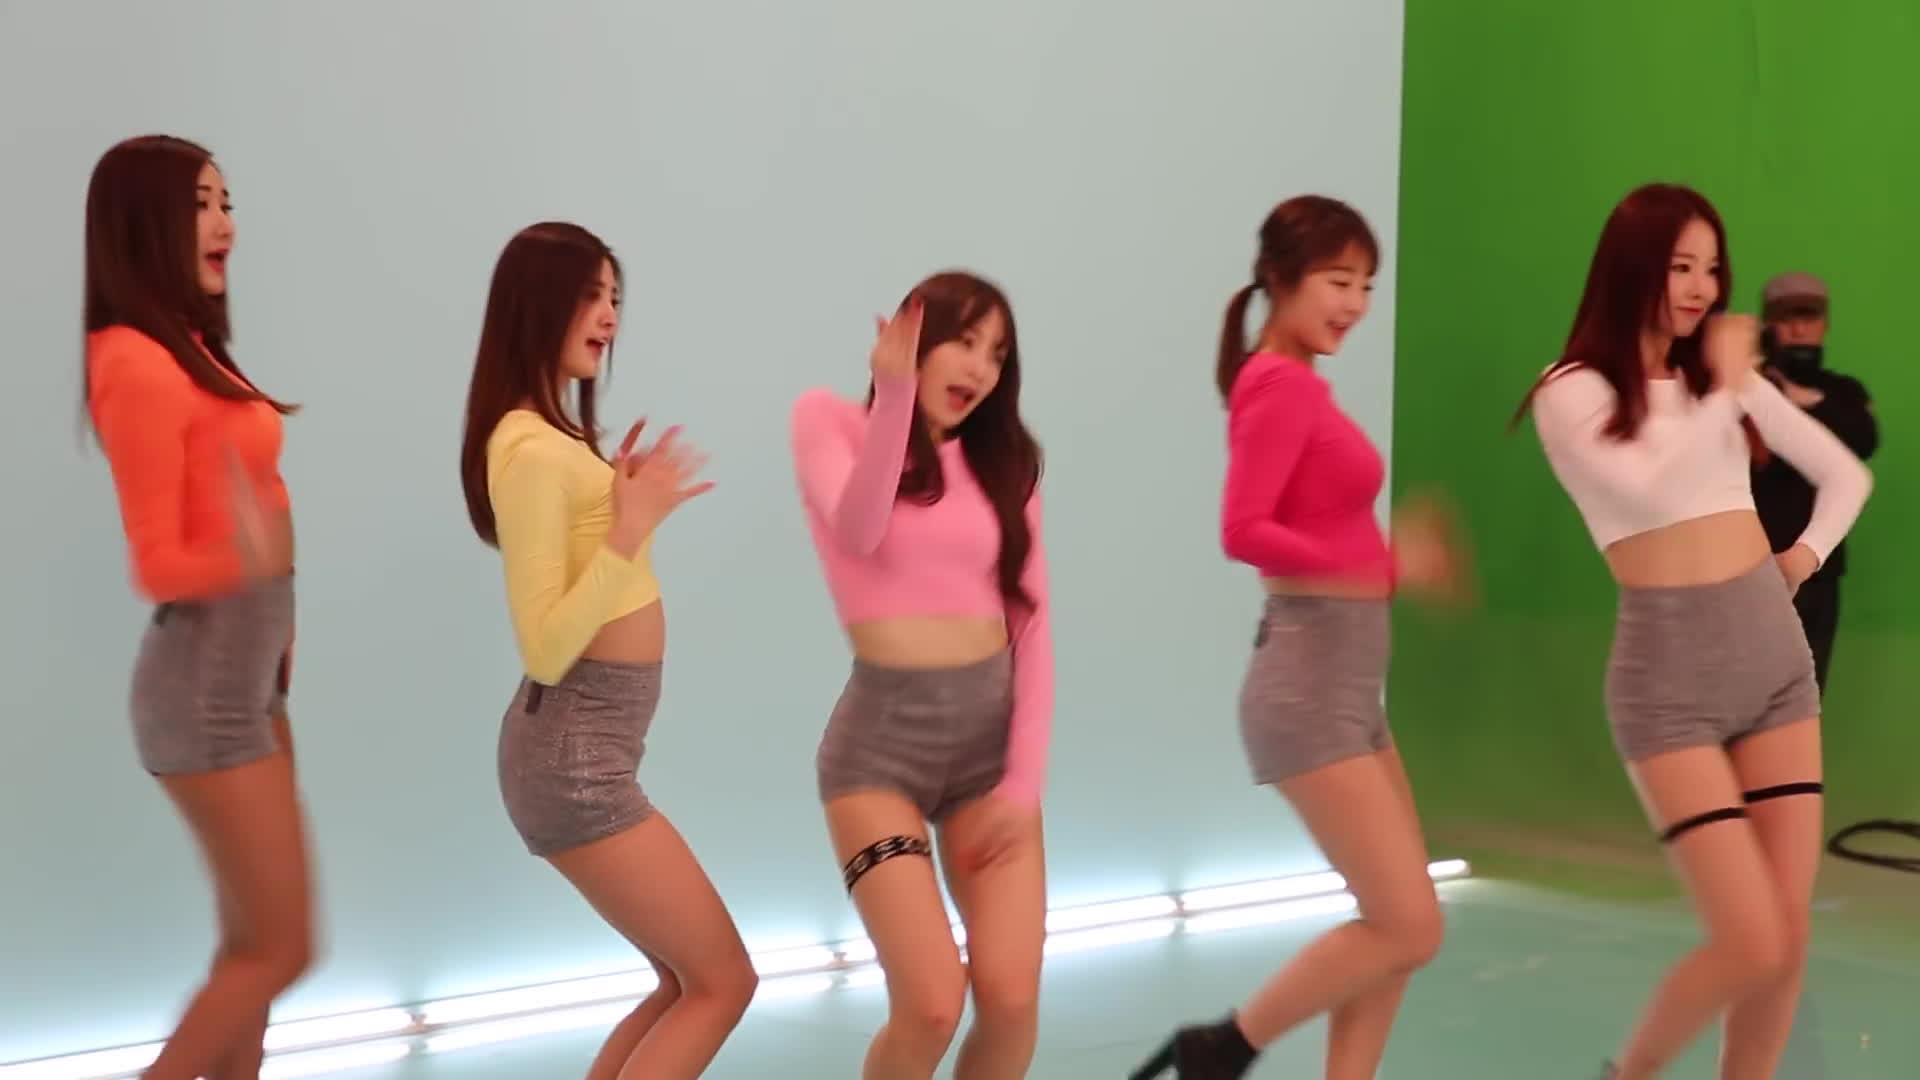 exid, exid (musical group), music (tv genre), up & down, EXID GIFs